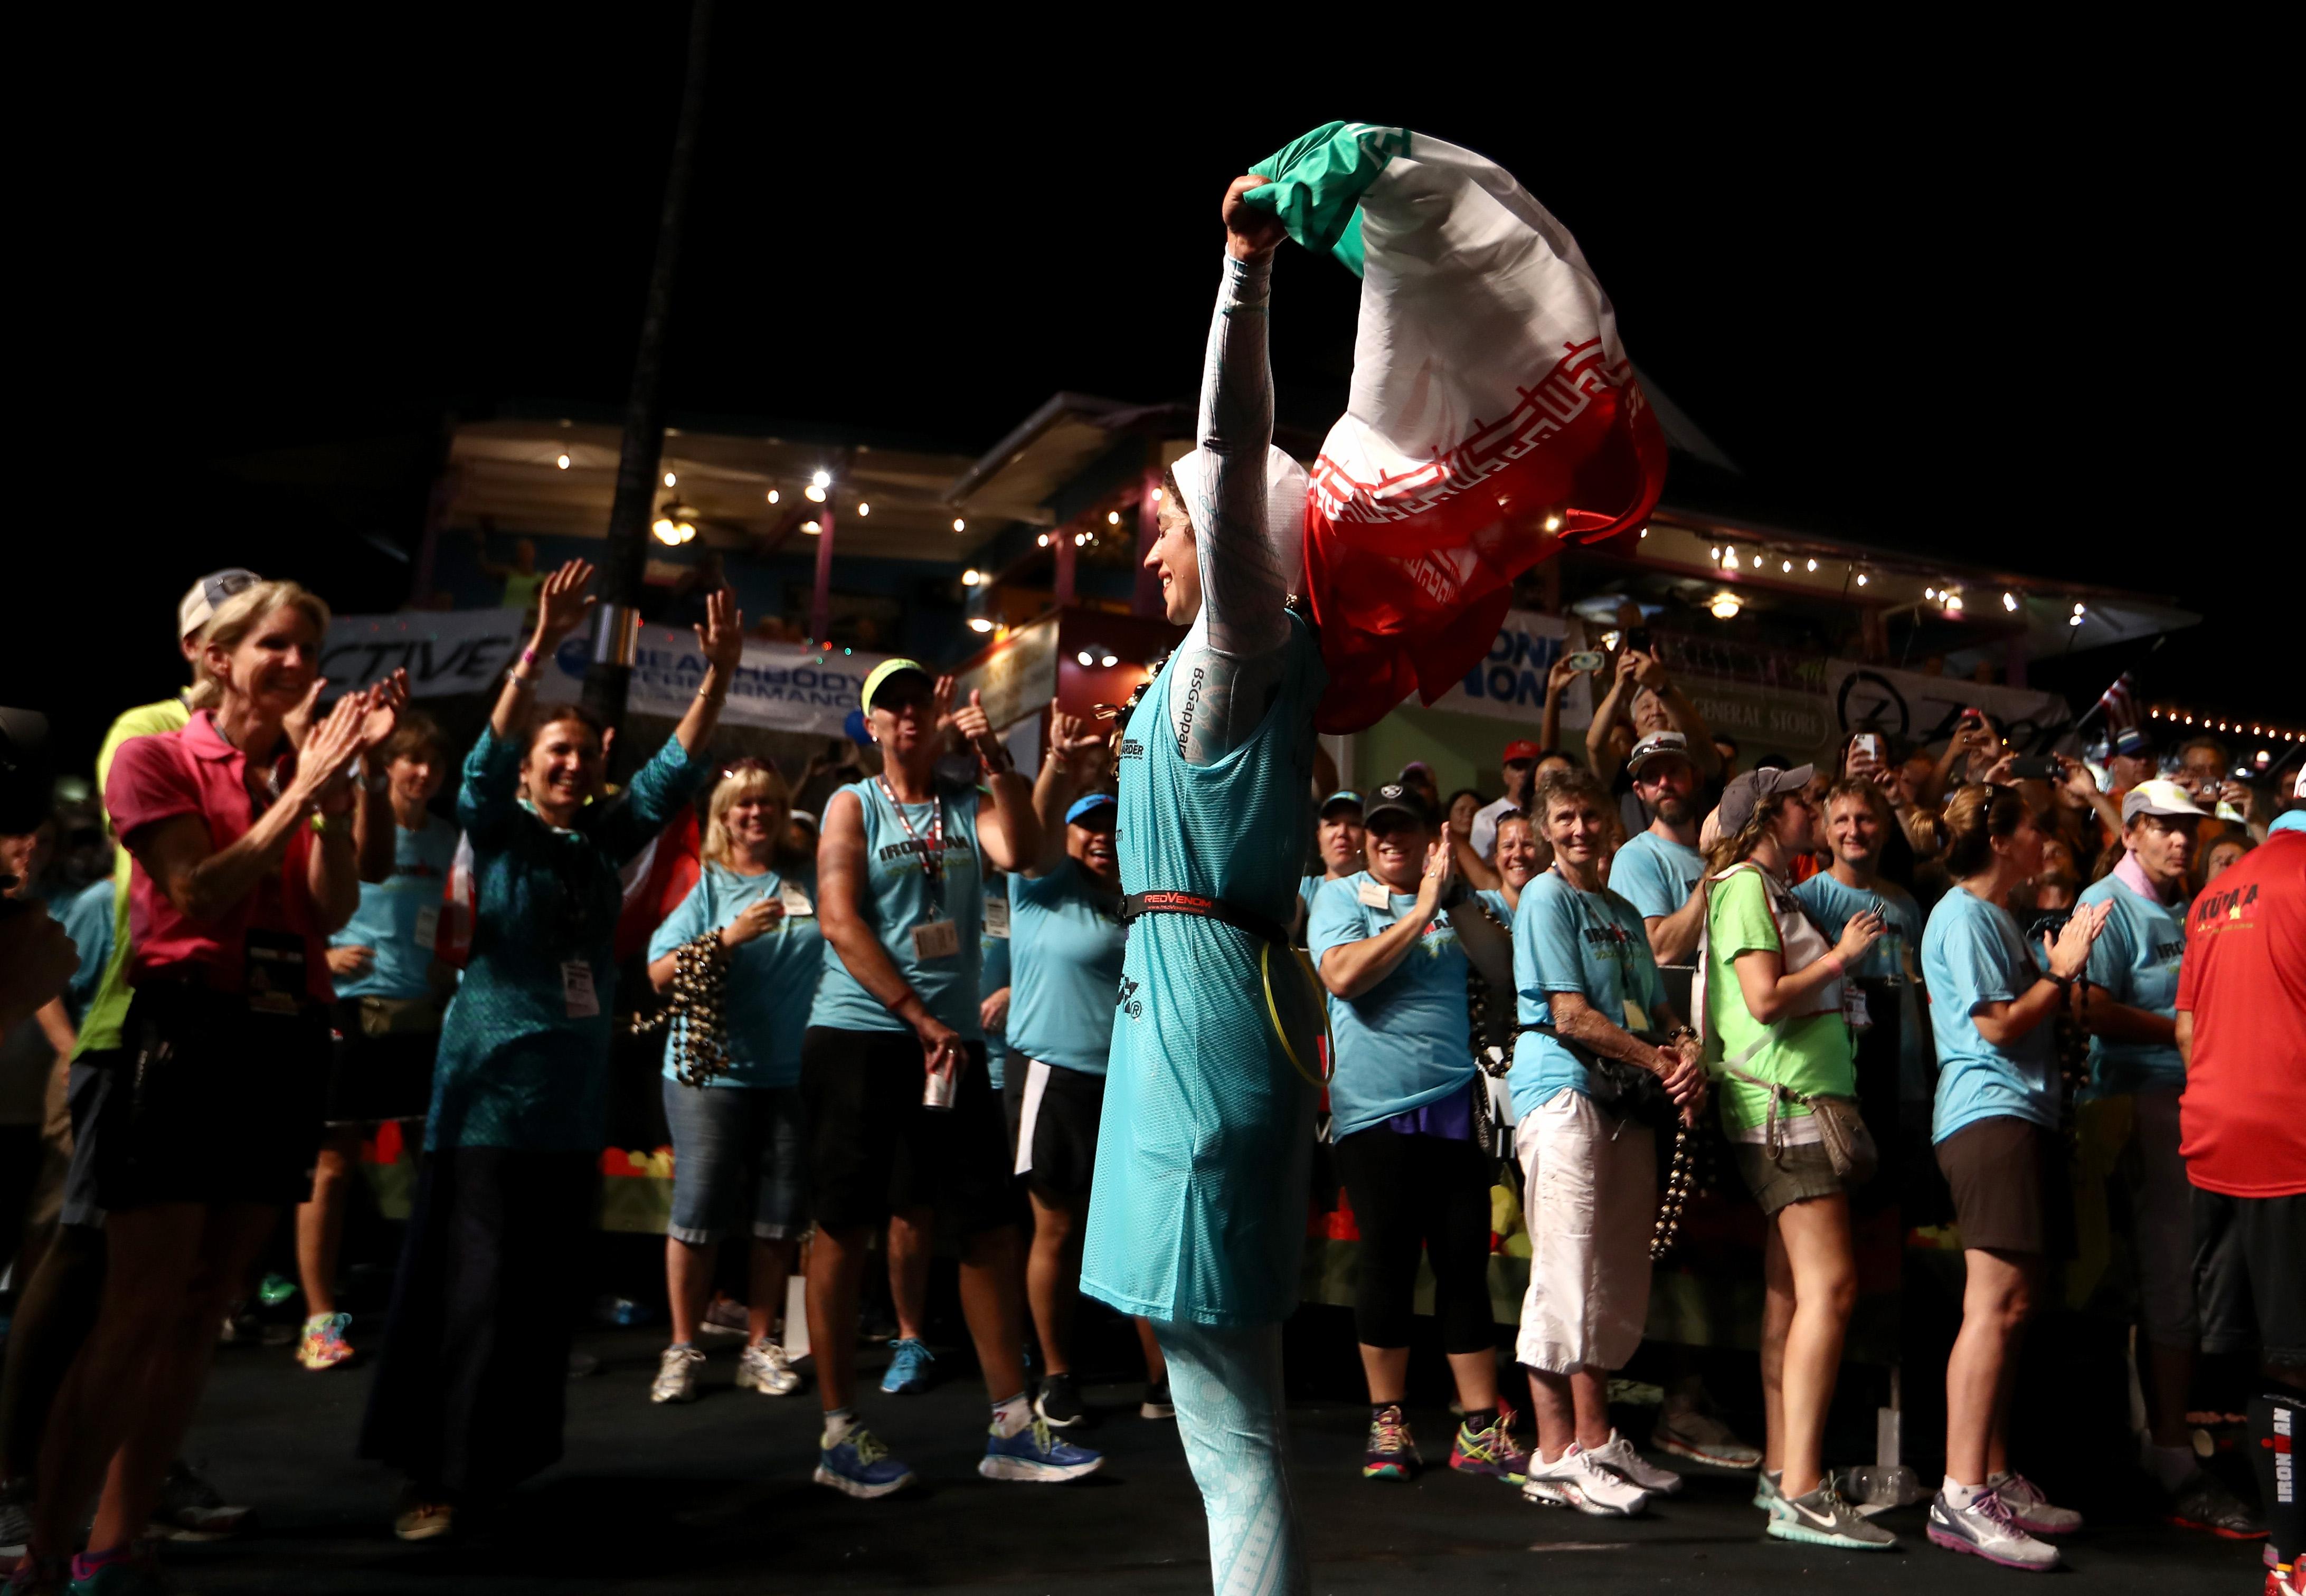 KAILUA KONA, HI - OCTOBER 08: Shirin Girami #151 of Iran reacts after crossing the finish line in the 2016 IRONMAN World Championship triathlon on October 8, 2016 in Kailua Kona, Hawaii. (Photo by Sean M. Haffey/Getty Images for Ironman)